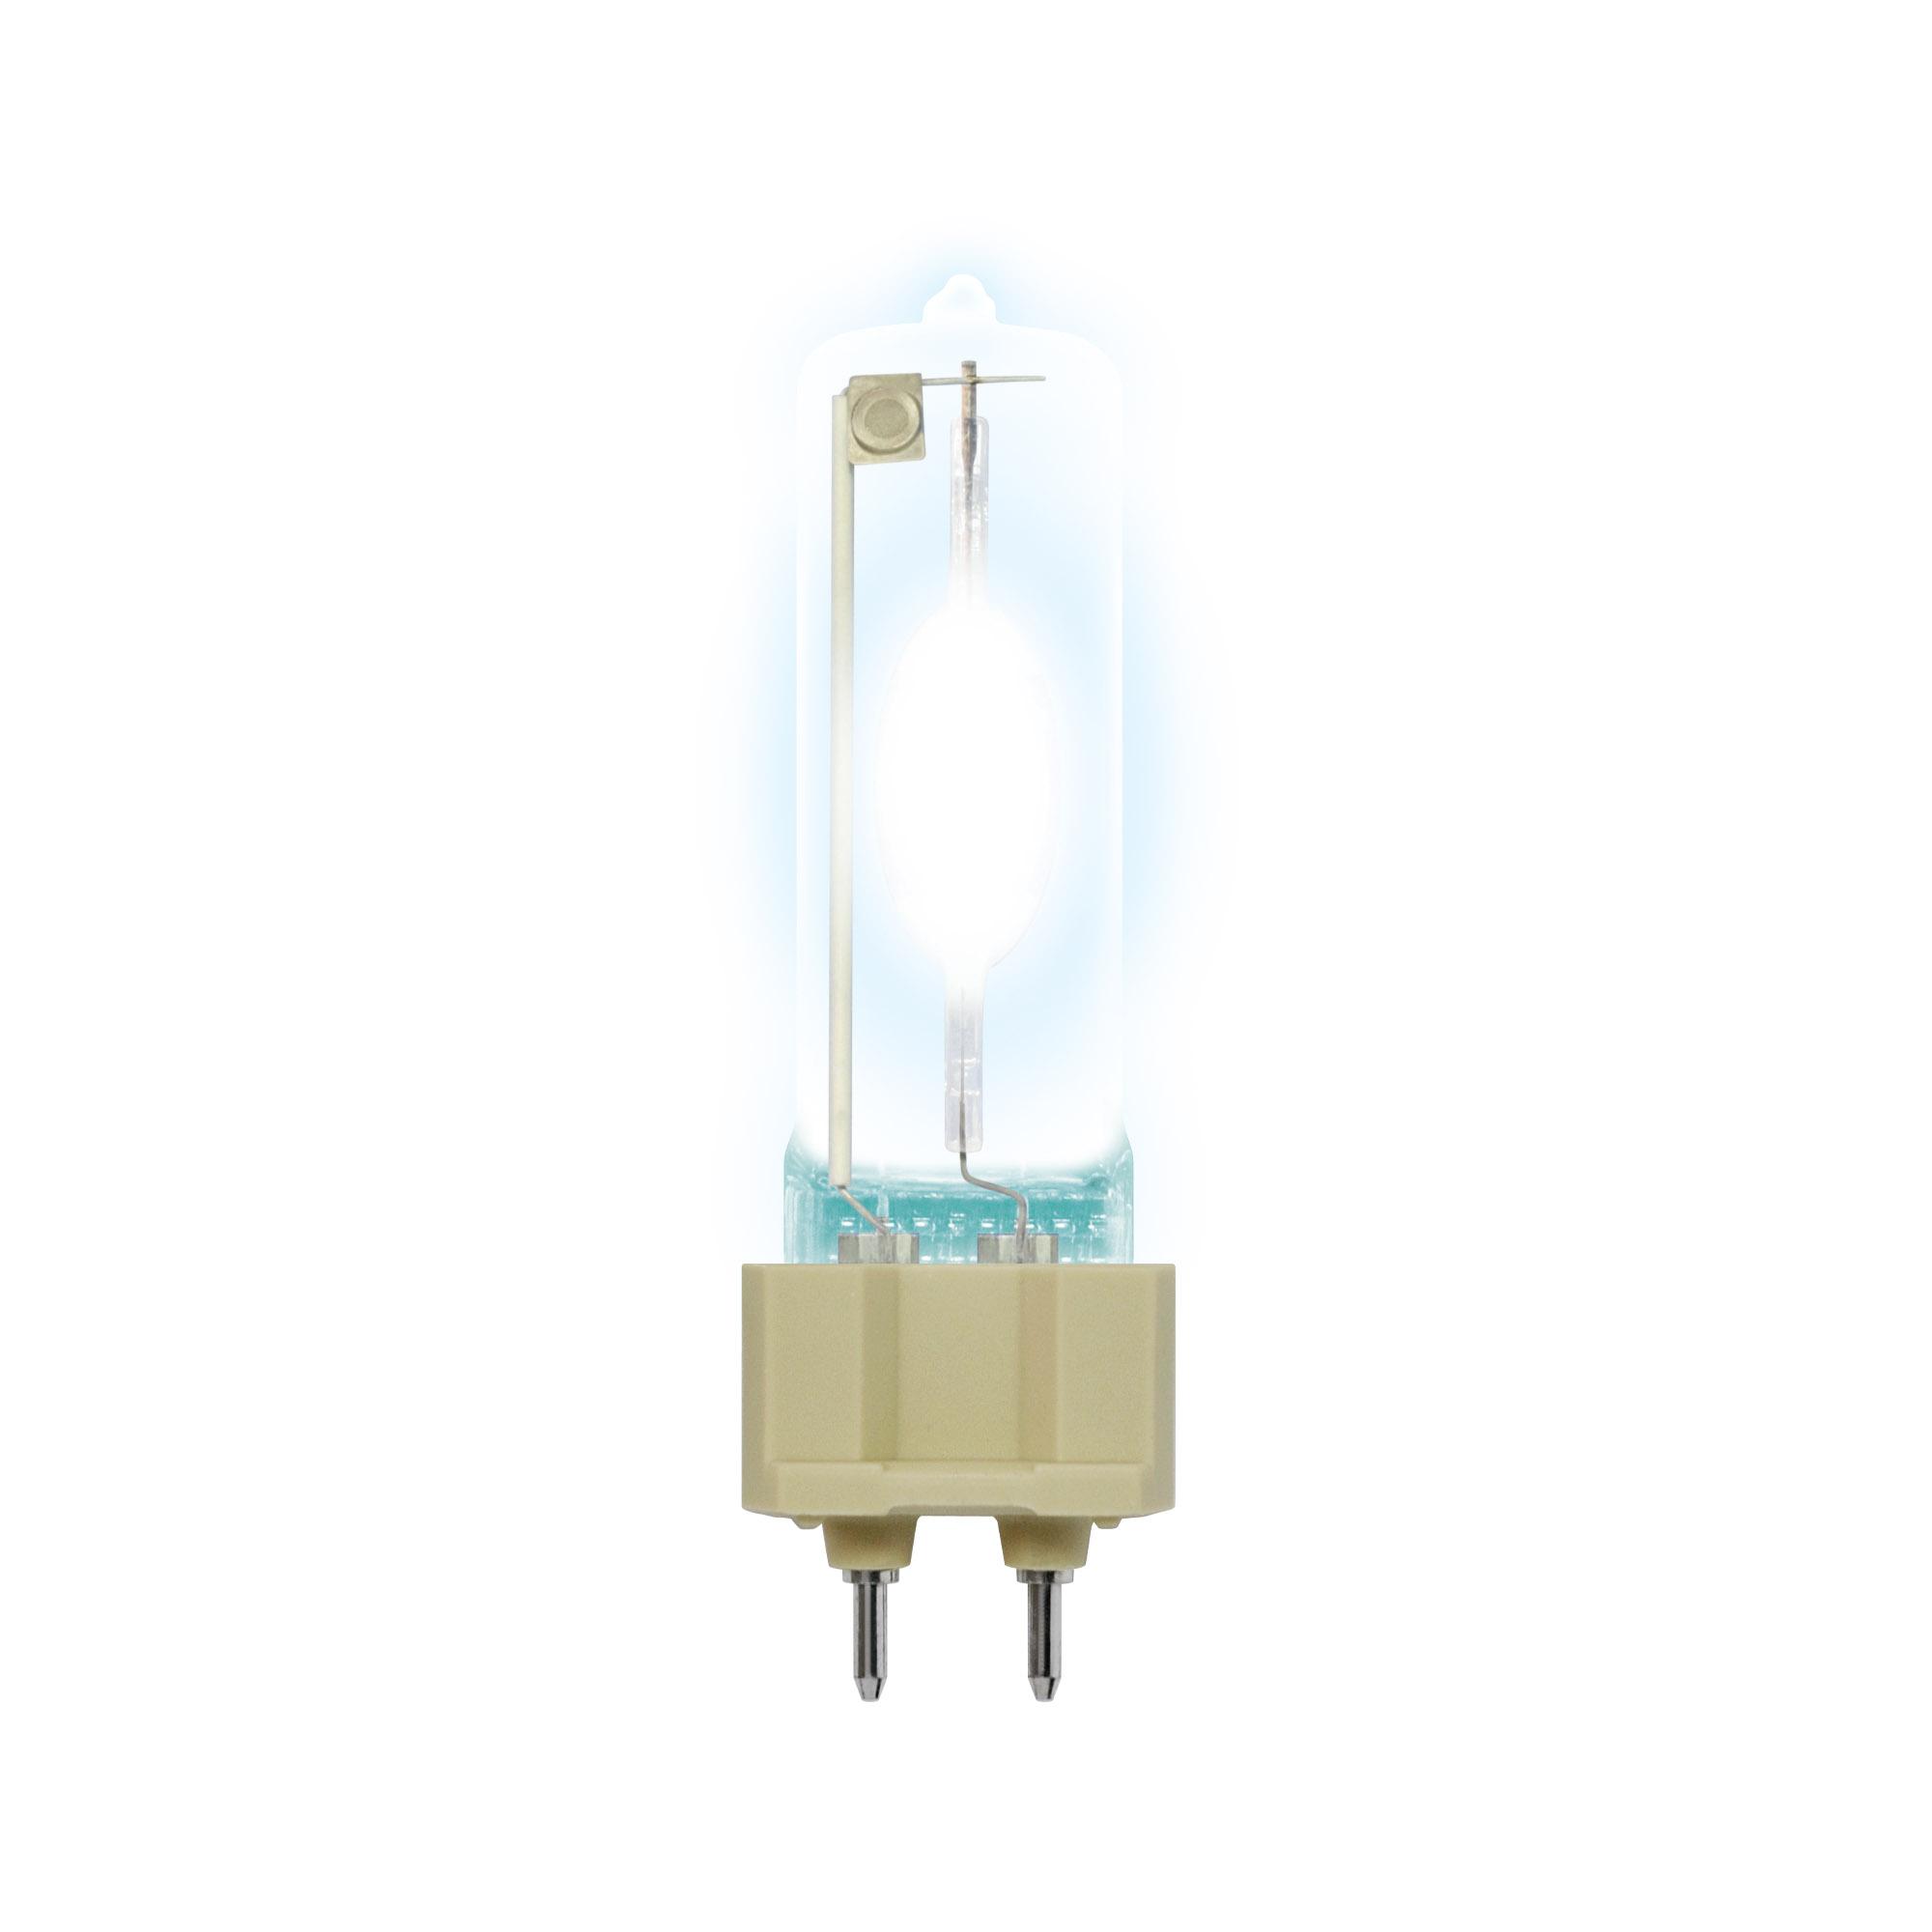 Лампа газоразрядная UnielЛампы<br>Тип лампы: галогенная,<br>Форма лампы: цилиндрическая,<br>Цвет колбы: прозрачная,<br>Тип цоколя: G12,<br>Мощность: 150,<br>Цветовая температура: 3300,<br>Цвет свечения: теплый<br>